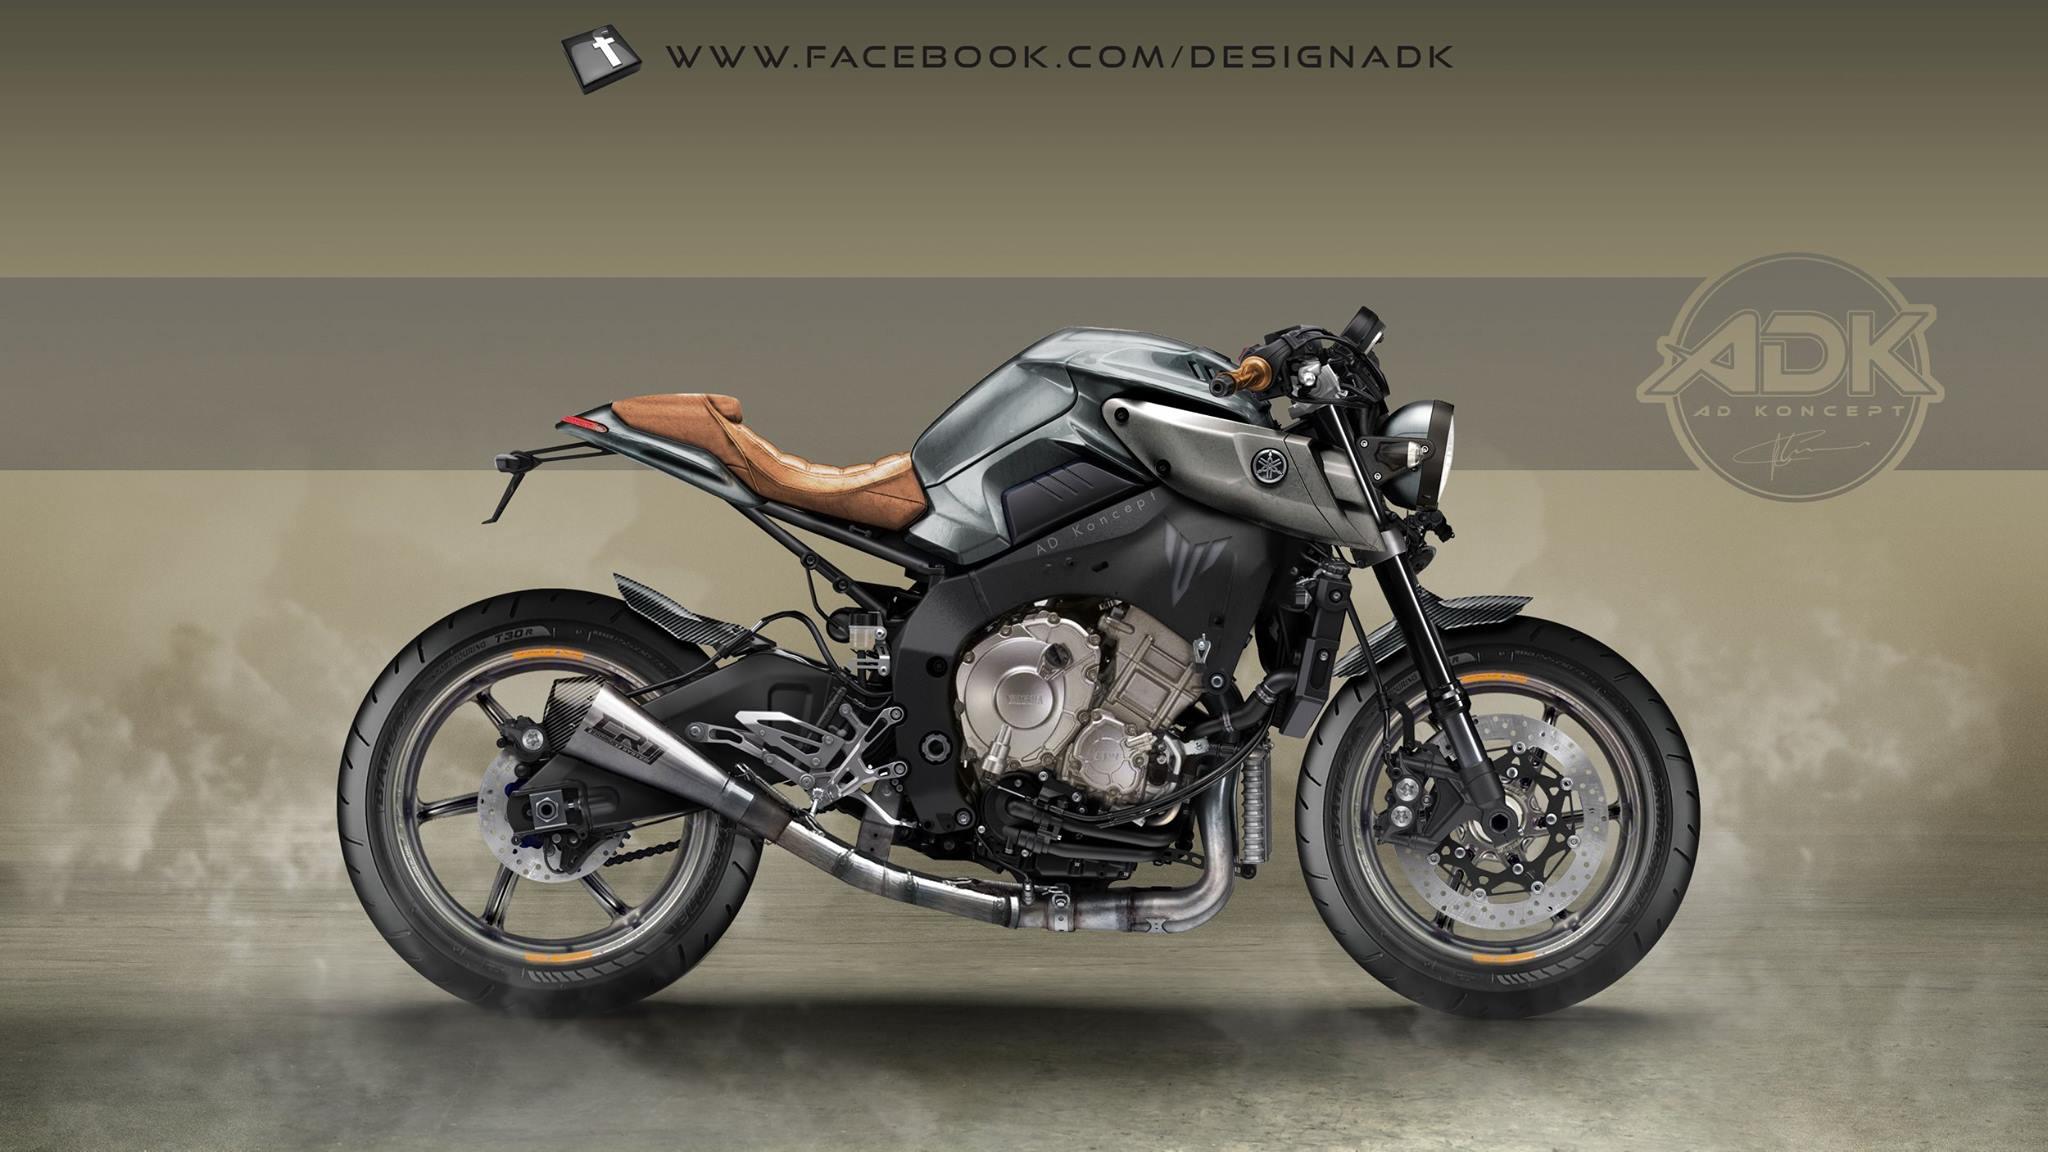 ad koncept custom FZ-10 4